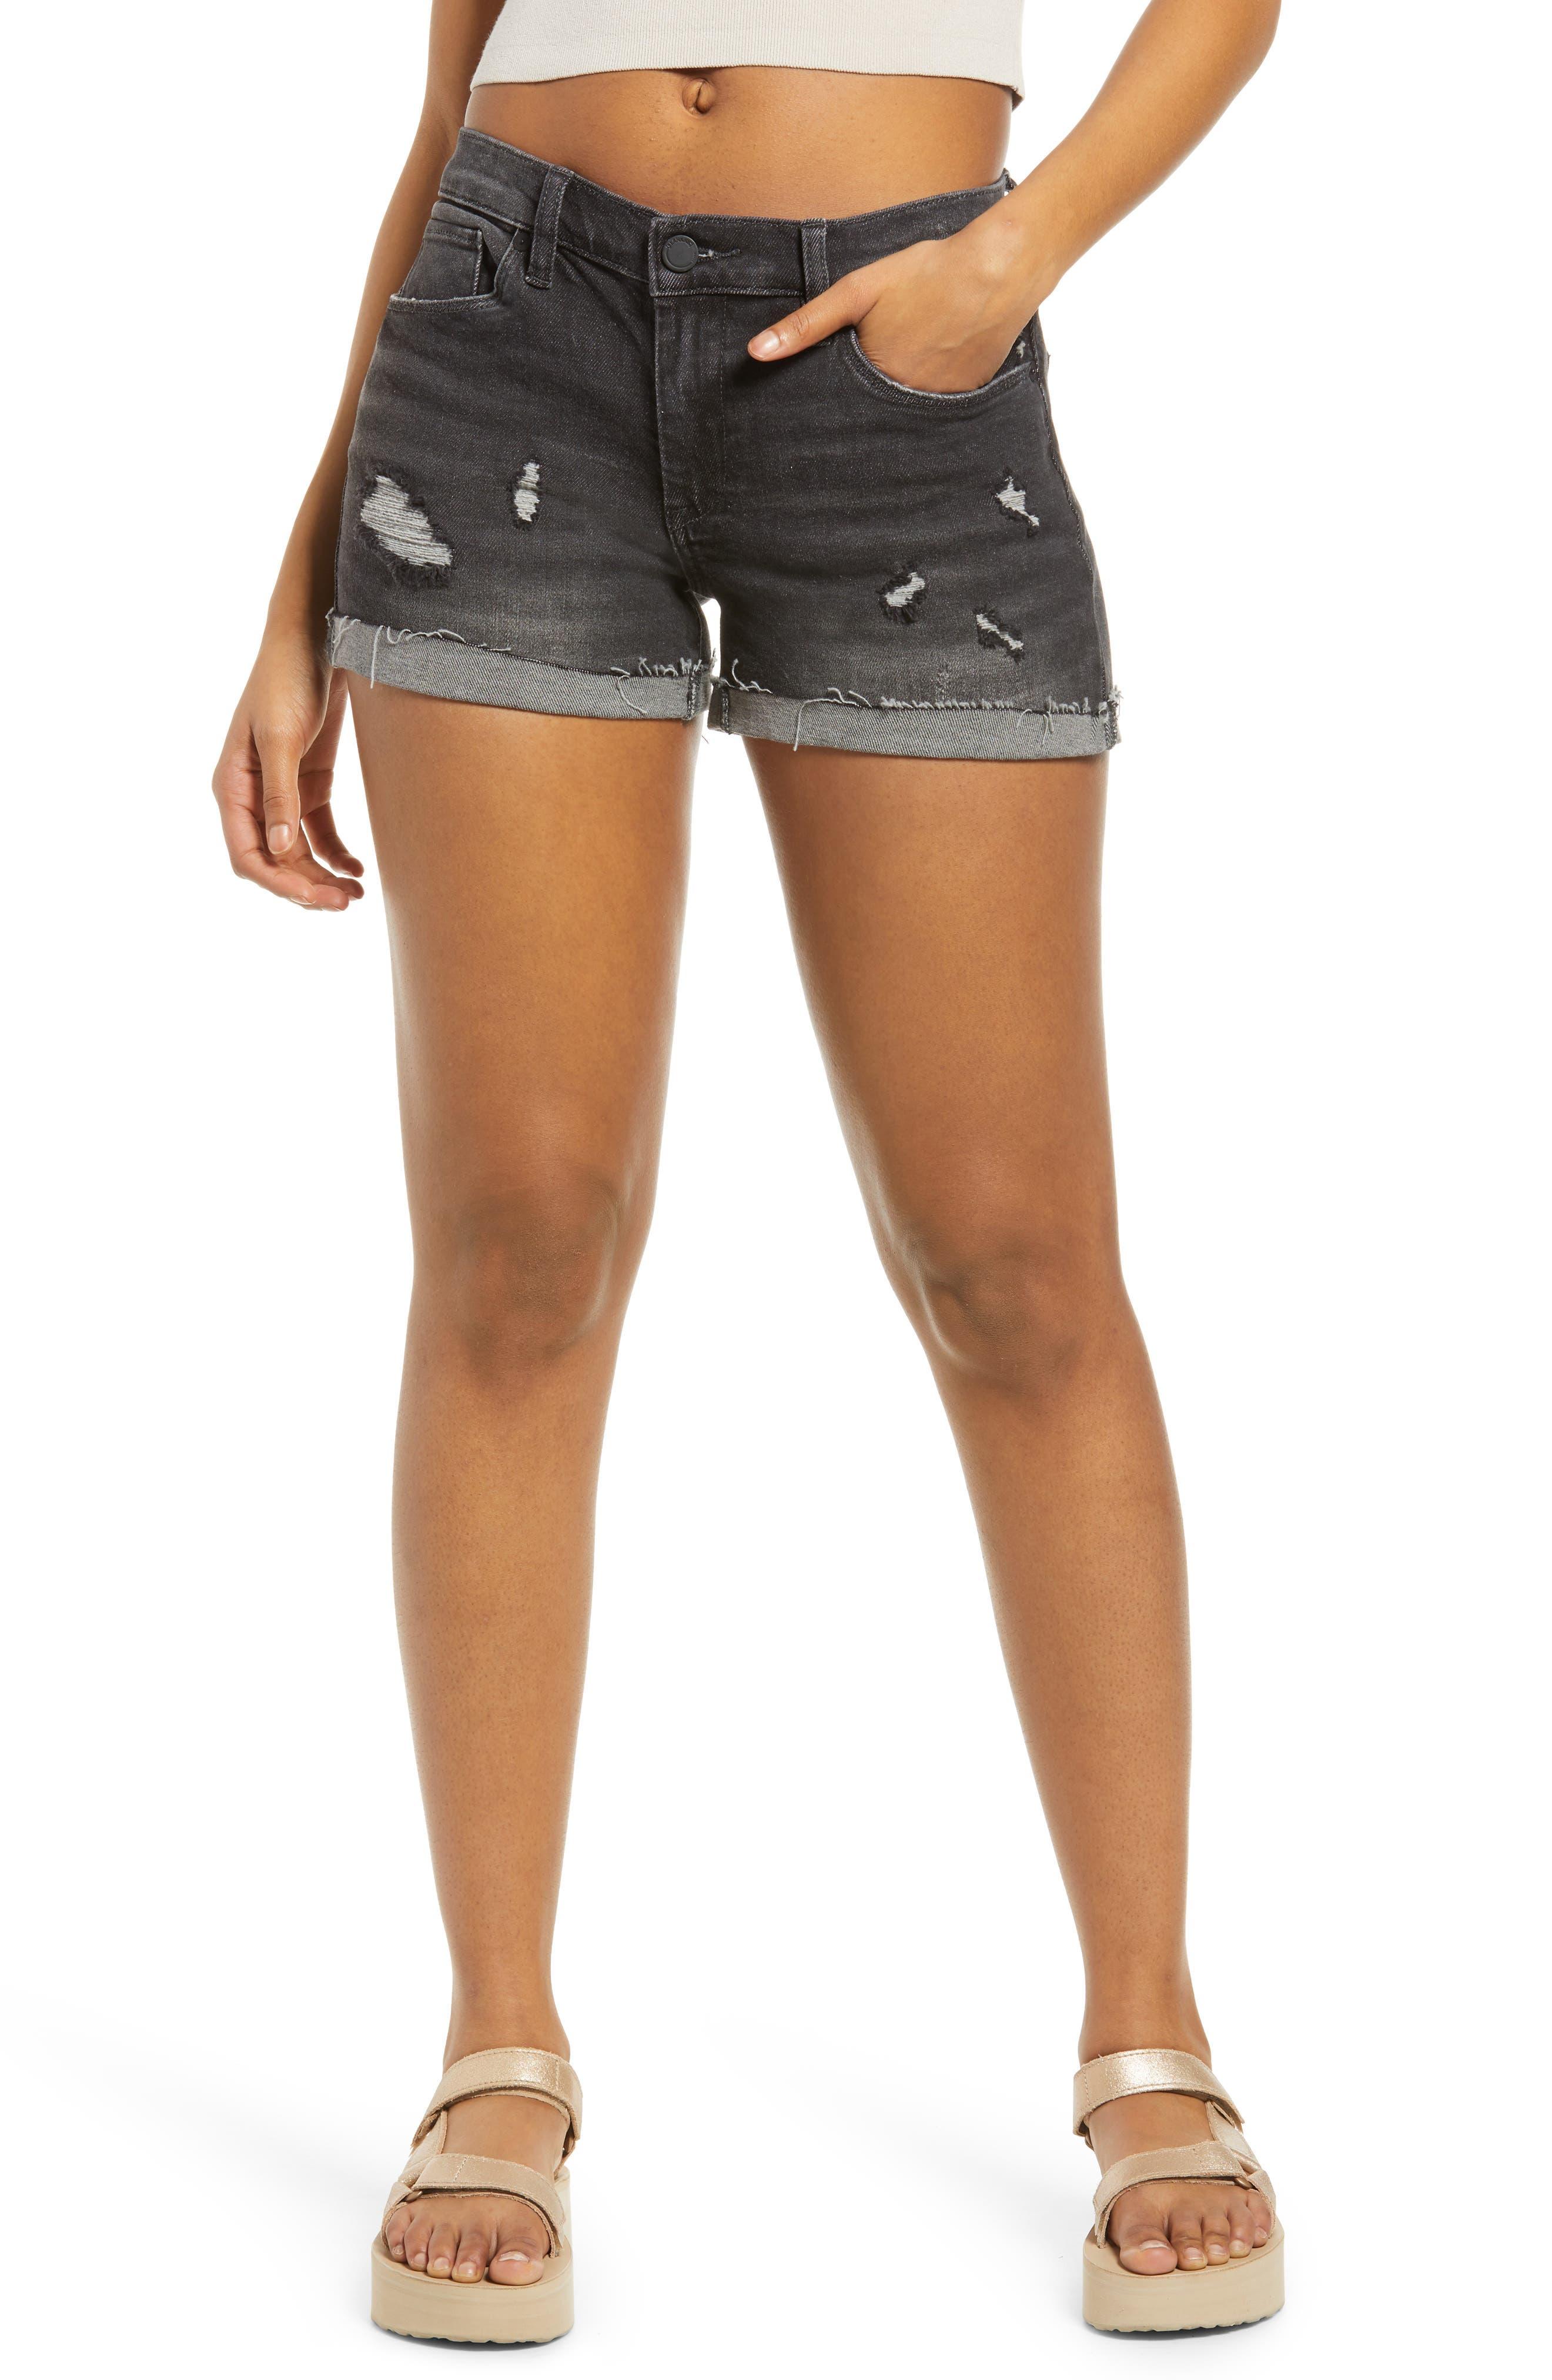 Womens Denim Hot Pants New Mini Ripped Shorts Blue Washed Size 6 8 10 12 14